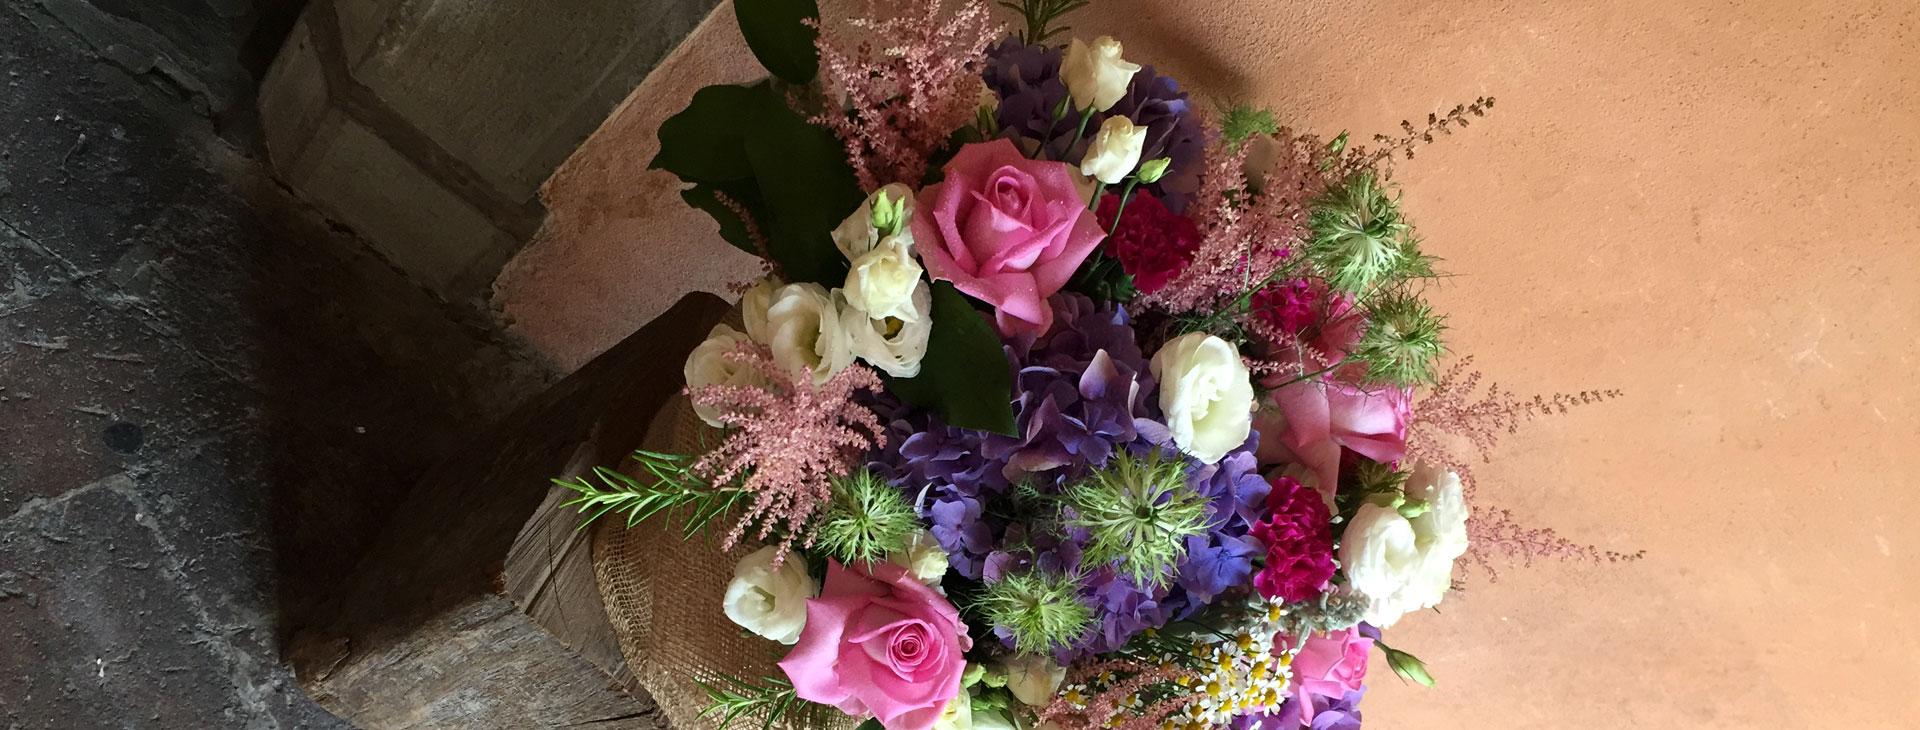 oggetthi-wedding-fiorista-b